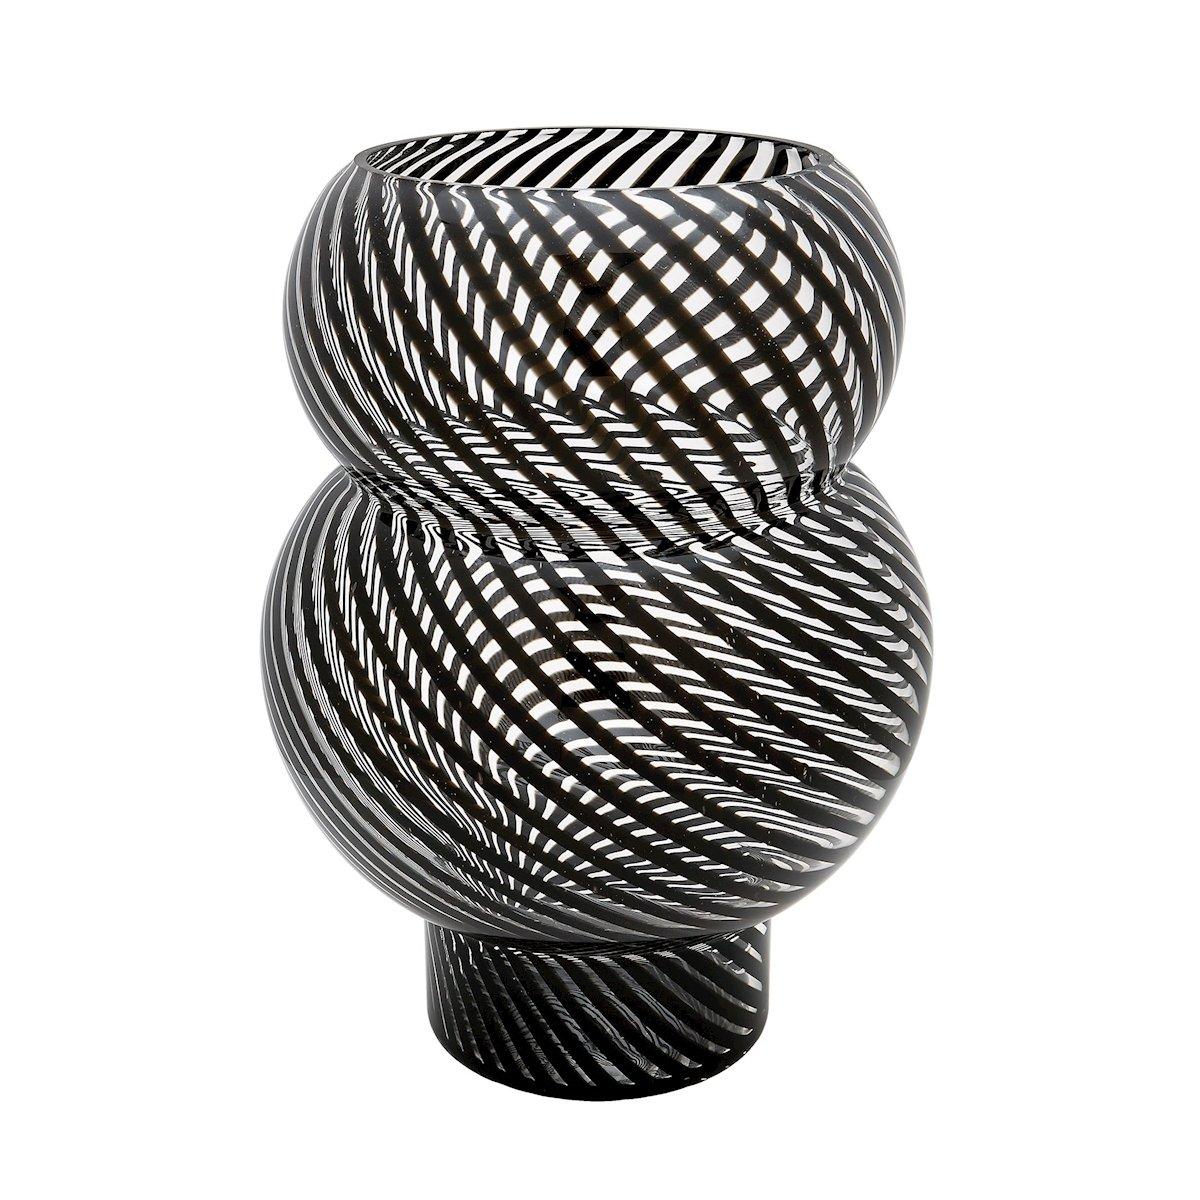 Dimondホームバブル花瓶 One Size 464079 B00L5OJTMA Black Whirl